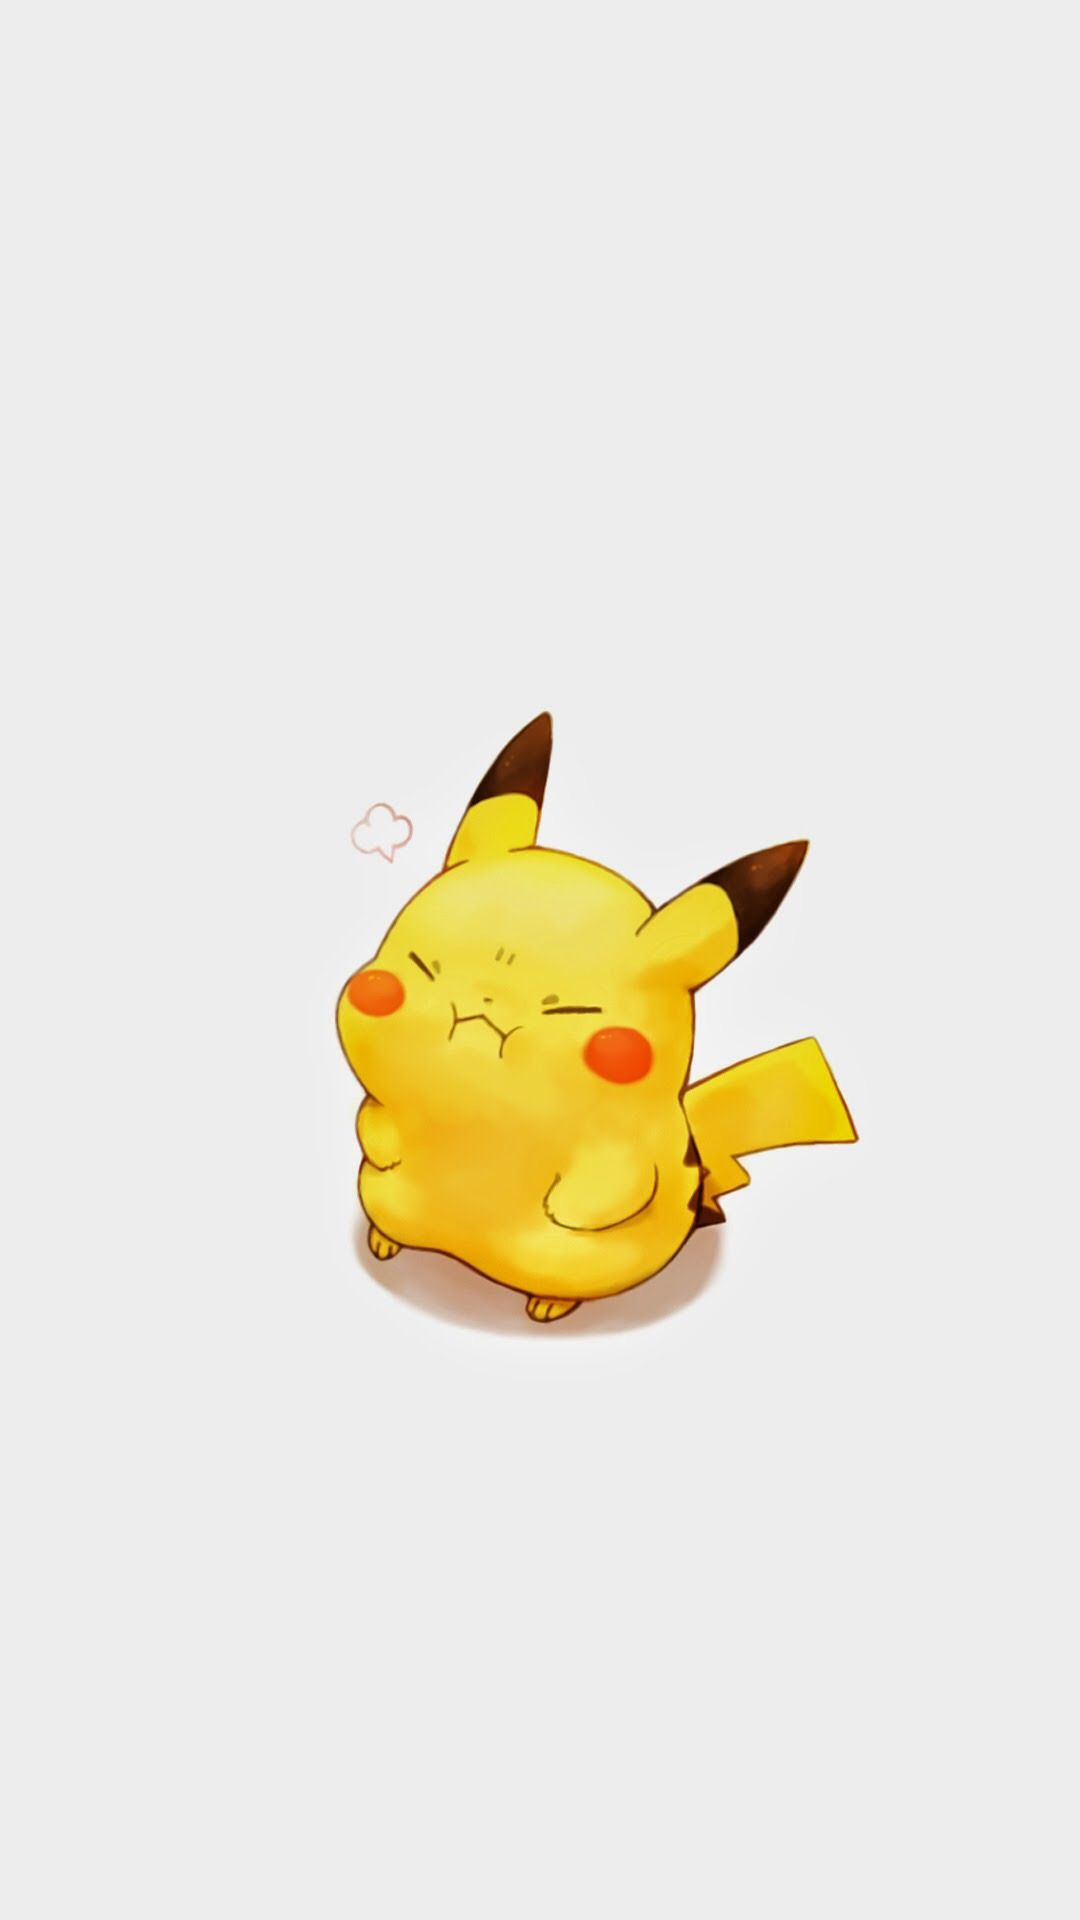 Pin by Cocoy Villa Cute pikachu Chibi 1080x1920